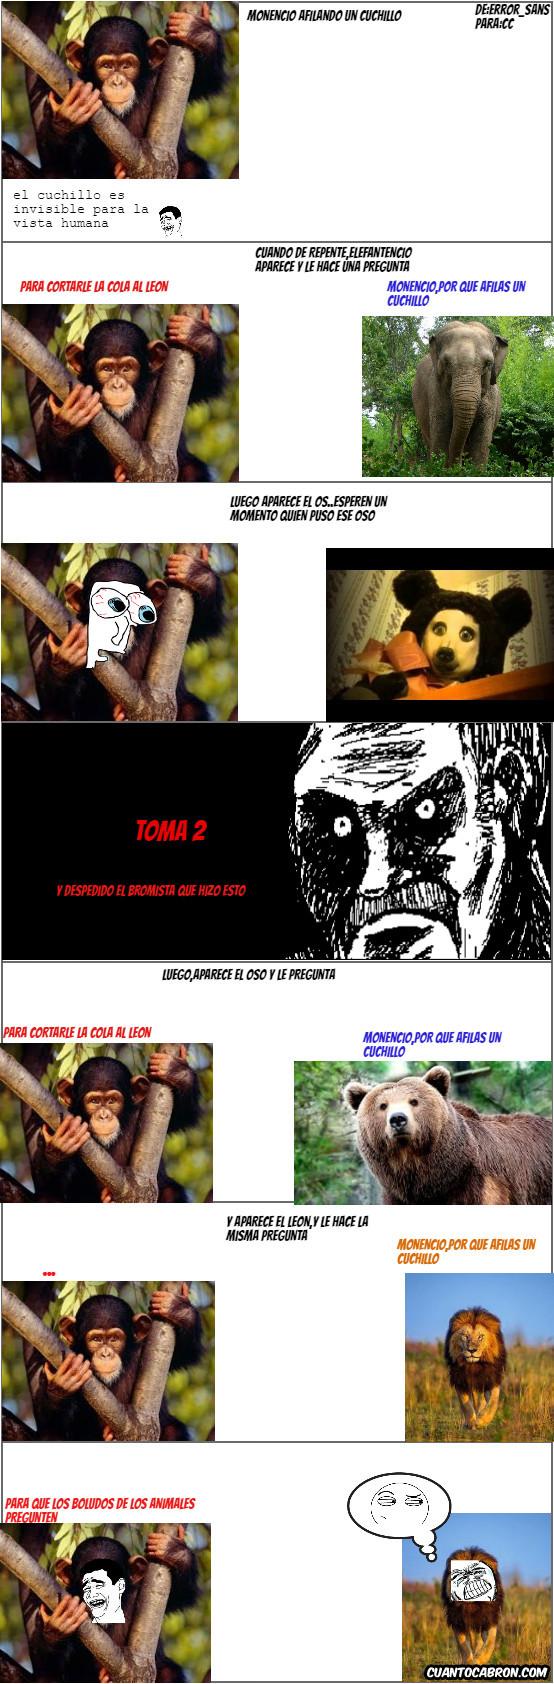 Animales,Crepypasta,Cuchillo,Elefantencio,Leon,Monencio,Oso normal,Oso Panda perro,Rage,Sospechoso